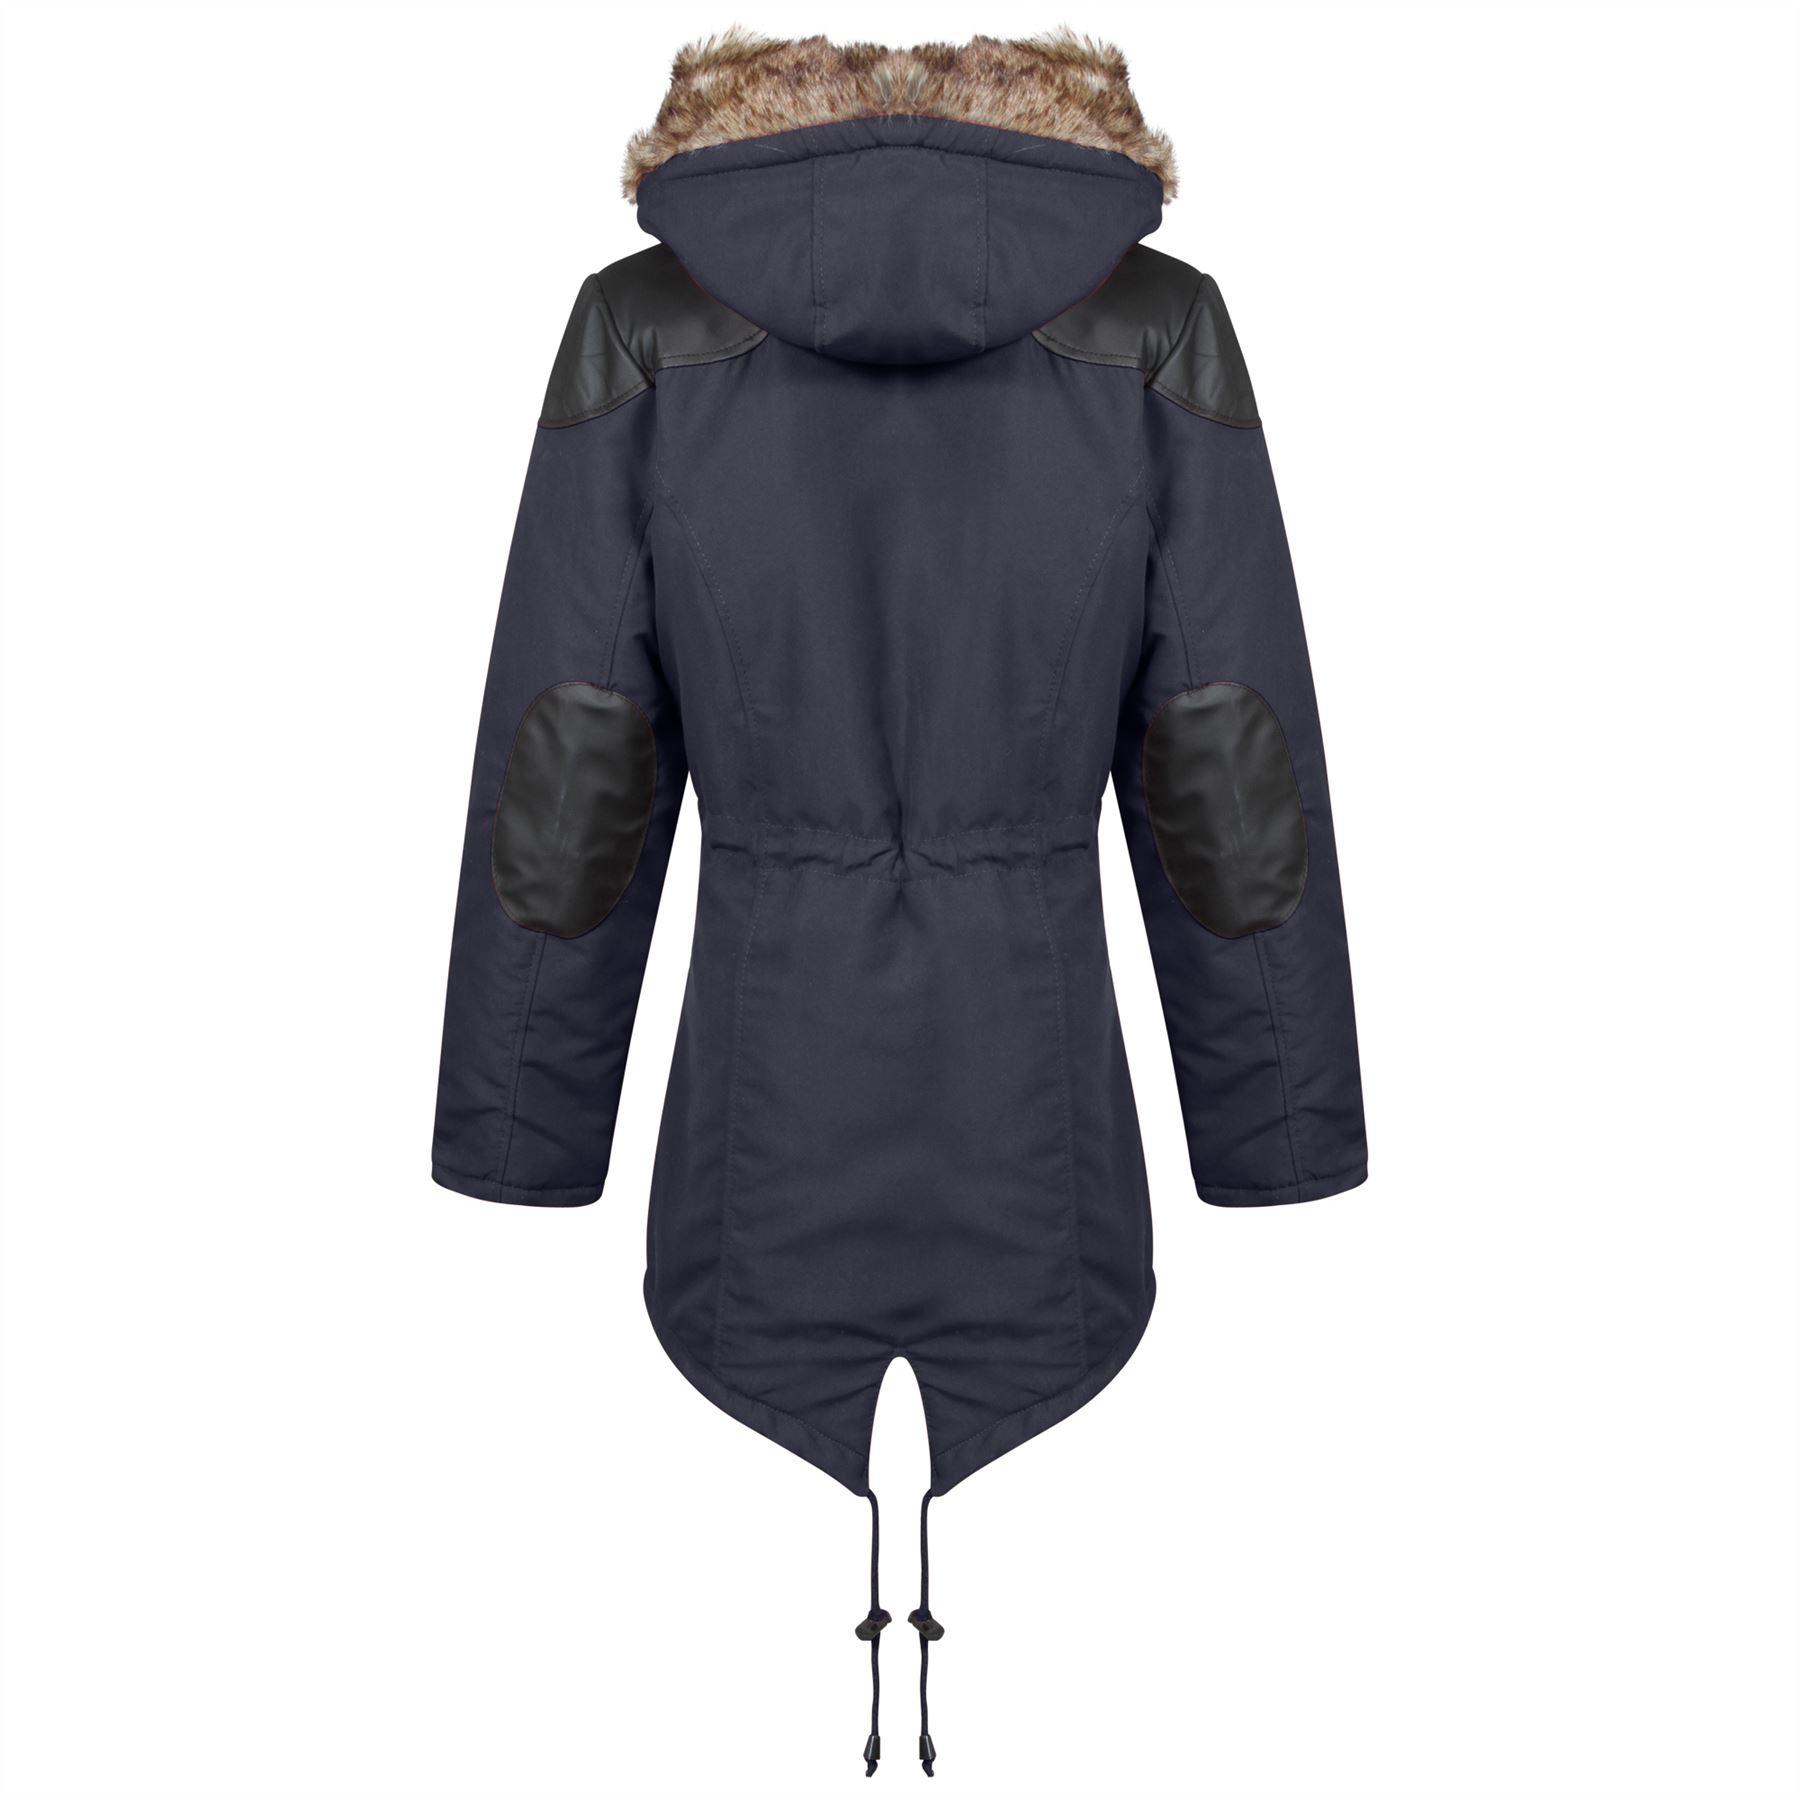 New Unisex Boys Girls Fishtail Contrast Inner Quilted Parka Jacket Coat